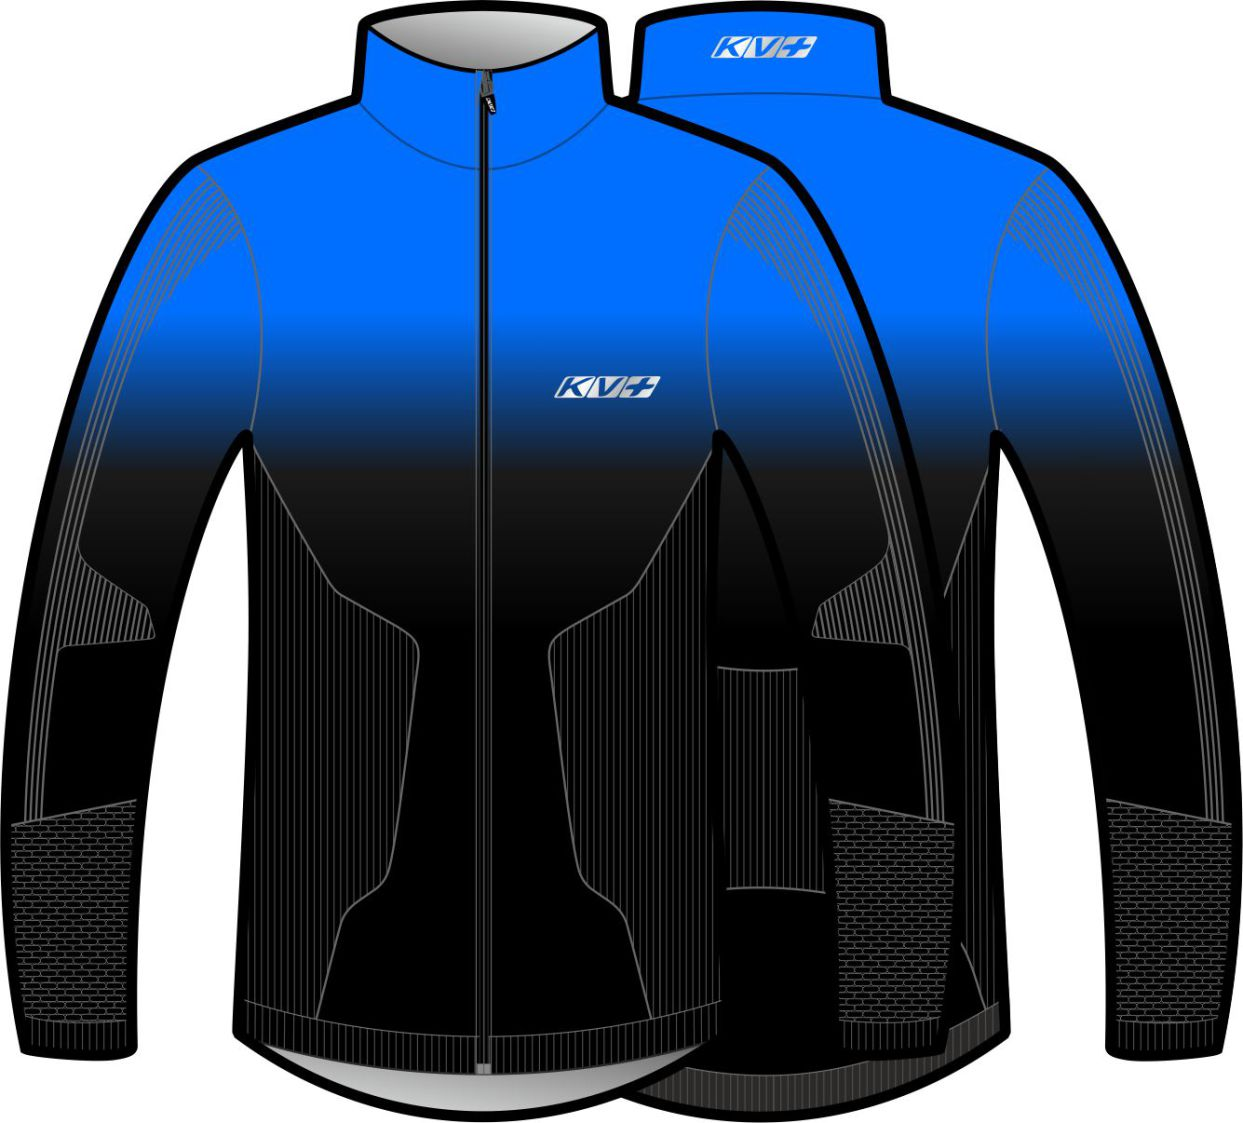 SEAMLESS JERSEY UNISEX (blue/black)